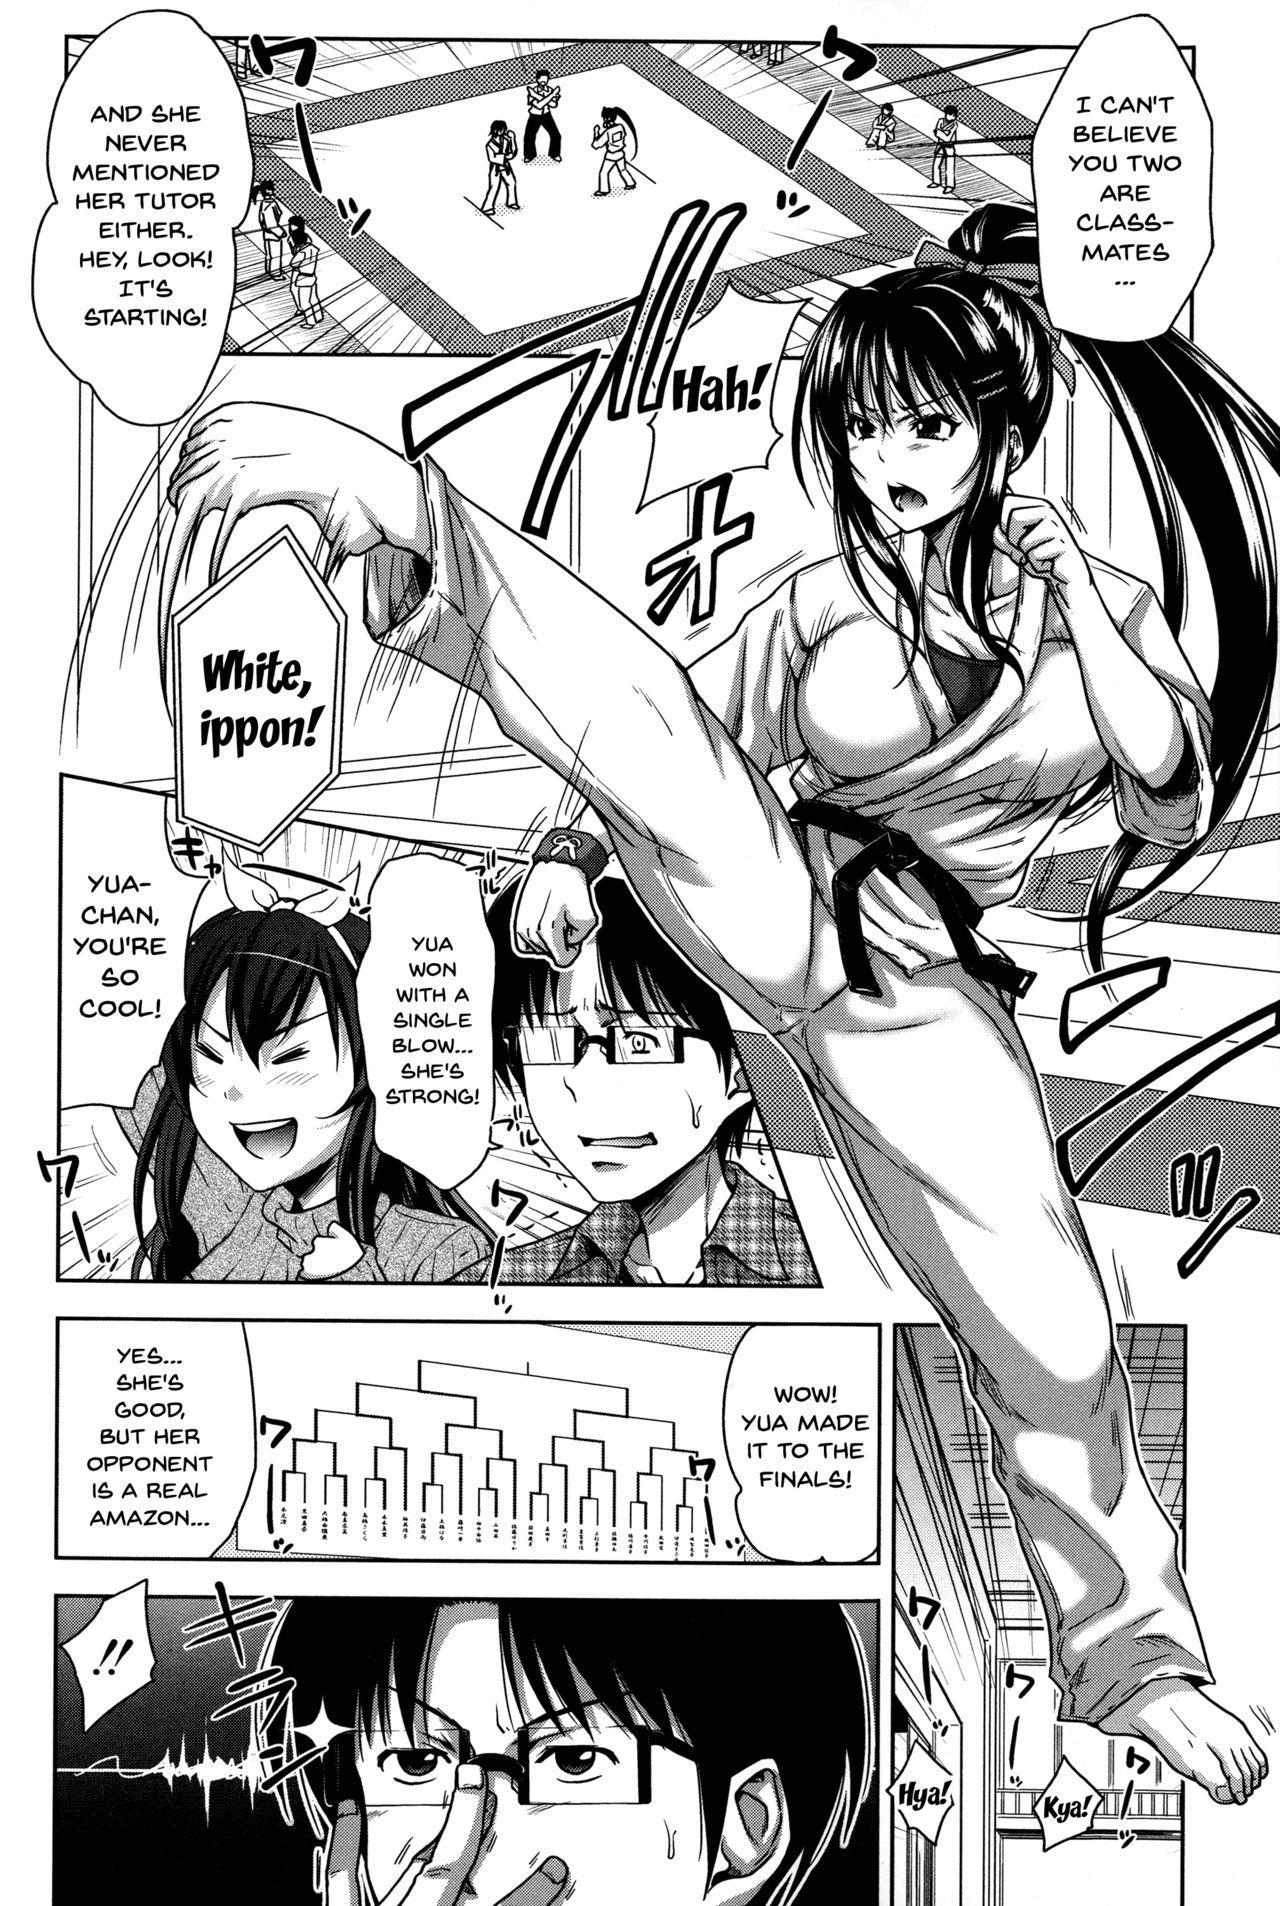 Pakotate! Seikouritsu 0% no Teppeki Bishojo VS Seikouritsu 100% no Hentai Katei Kyoushi   Pakotate! Sex Rate 0% Iron-Willed Beautiful Virgins VS Sex Rate 100% Perverted Coach 65